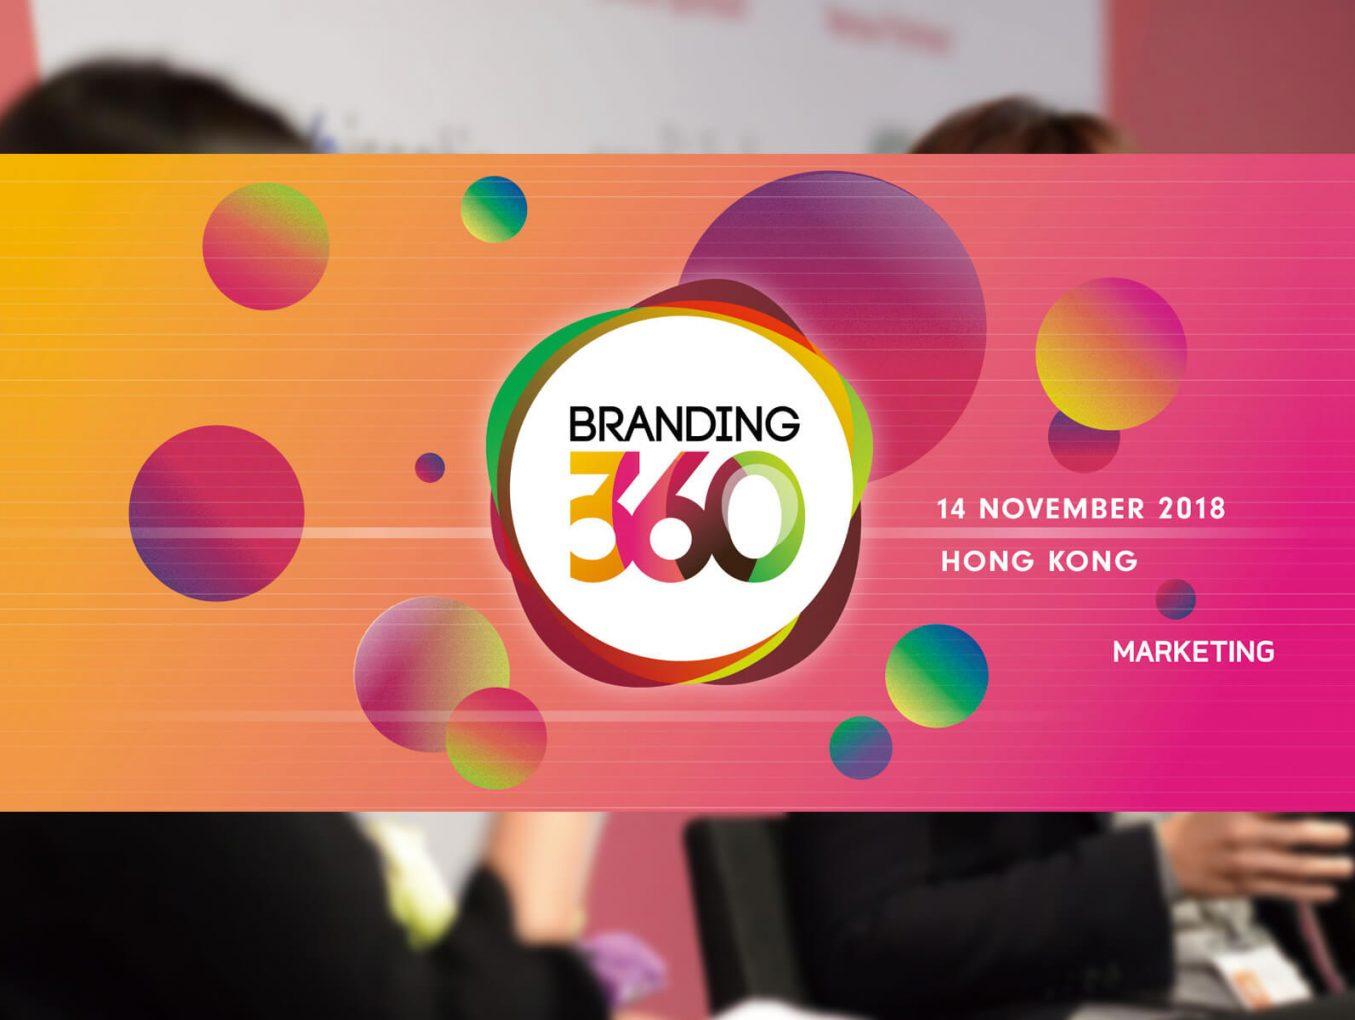 Branding 360 2018<br>2018年11月14日